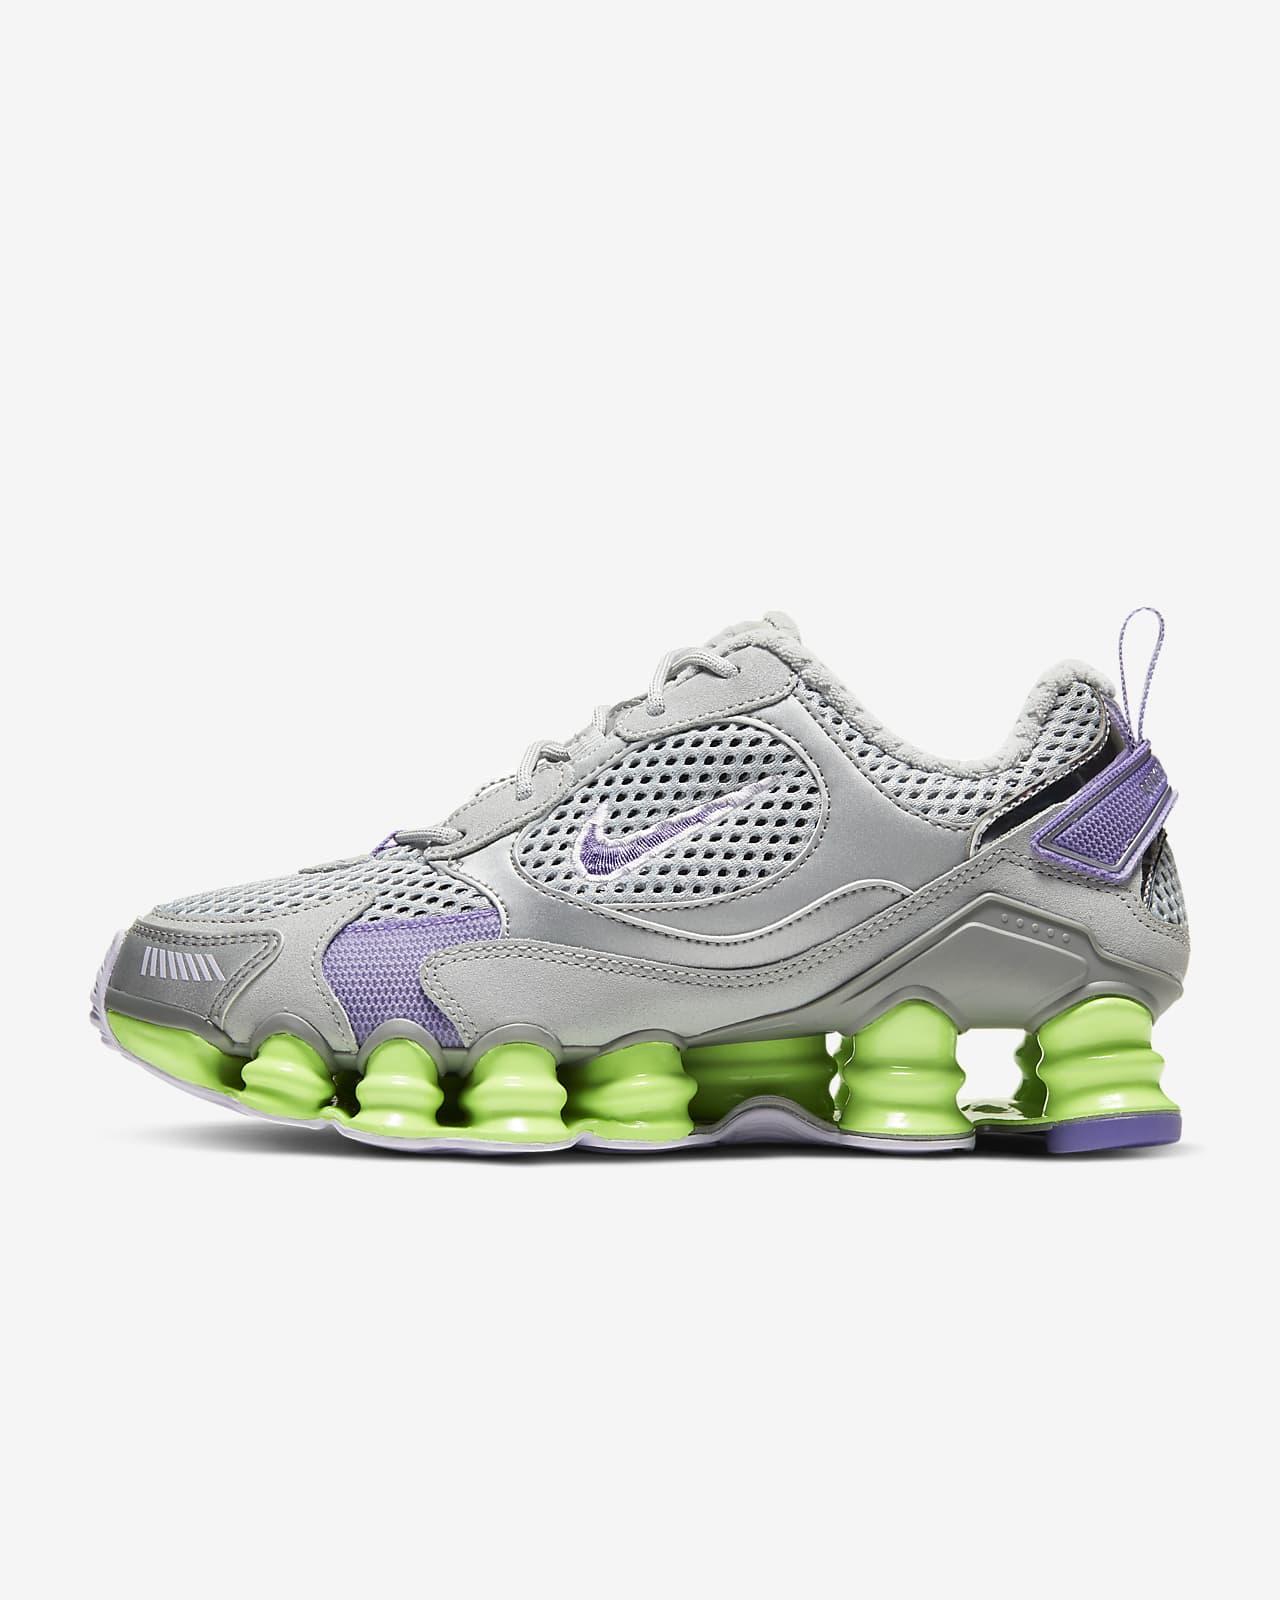 Nike Shox TL Nova SP Women's Shoes